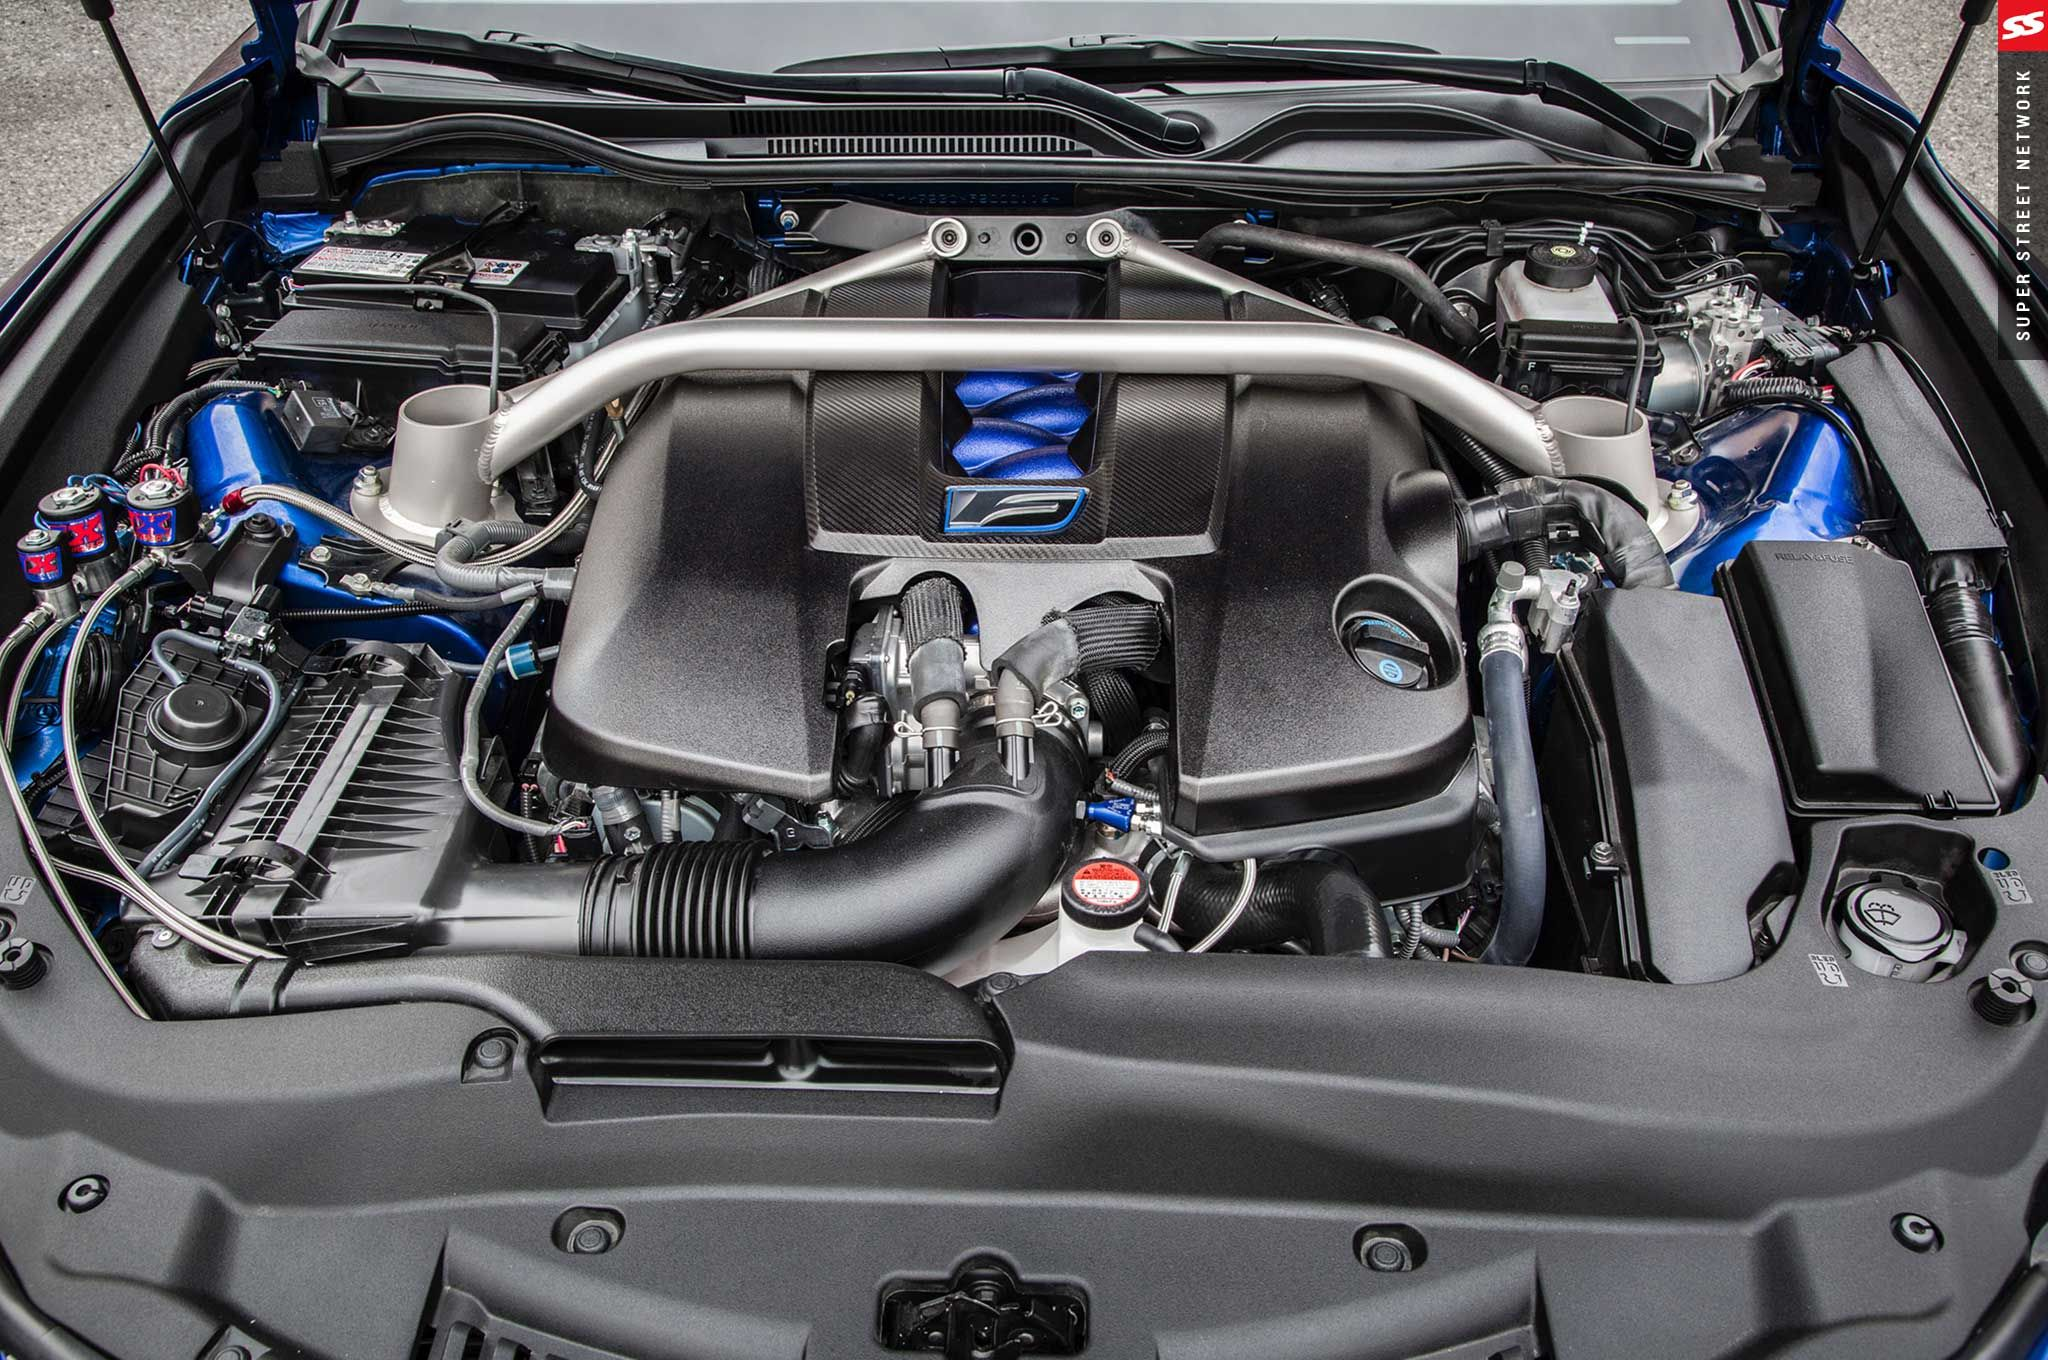 2006 Honda Accord Fuse Box Diagram Gumball 3000 Stockholm To Las Vegas 2015 Lexus Rc F Engine